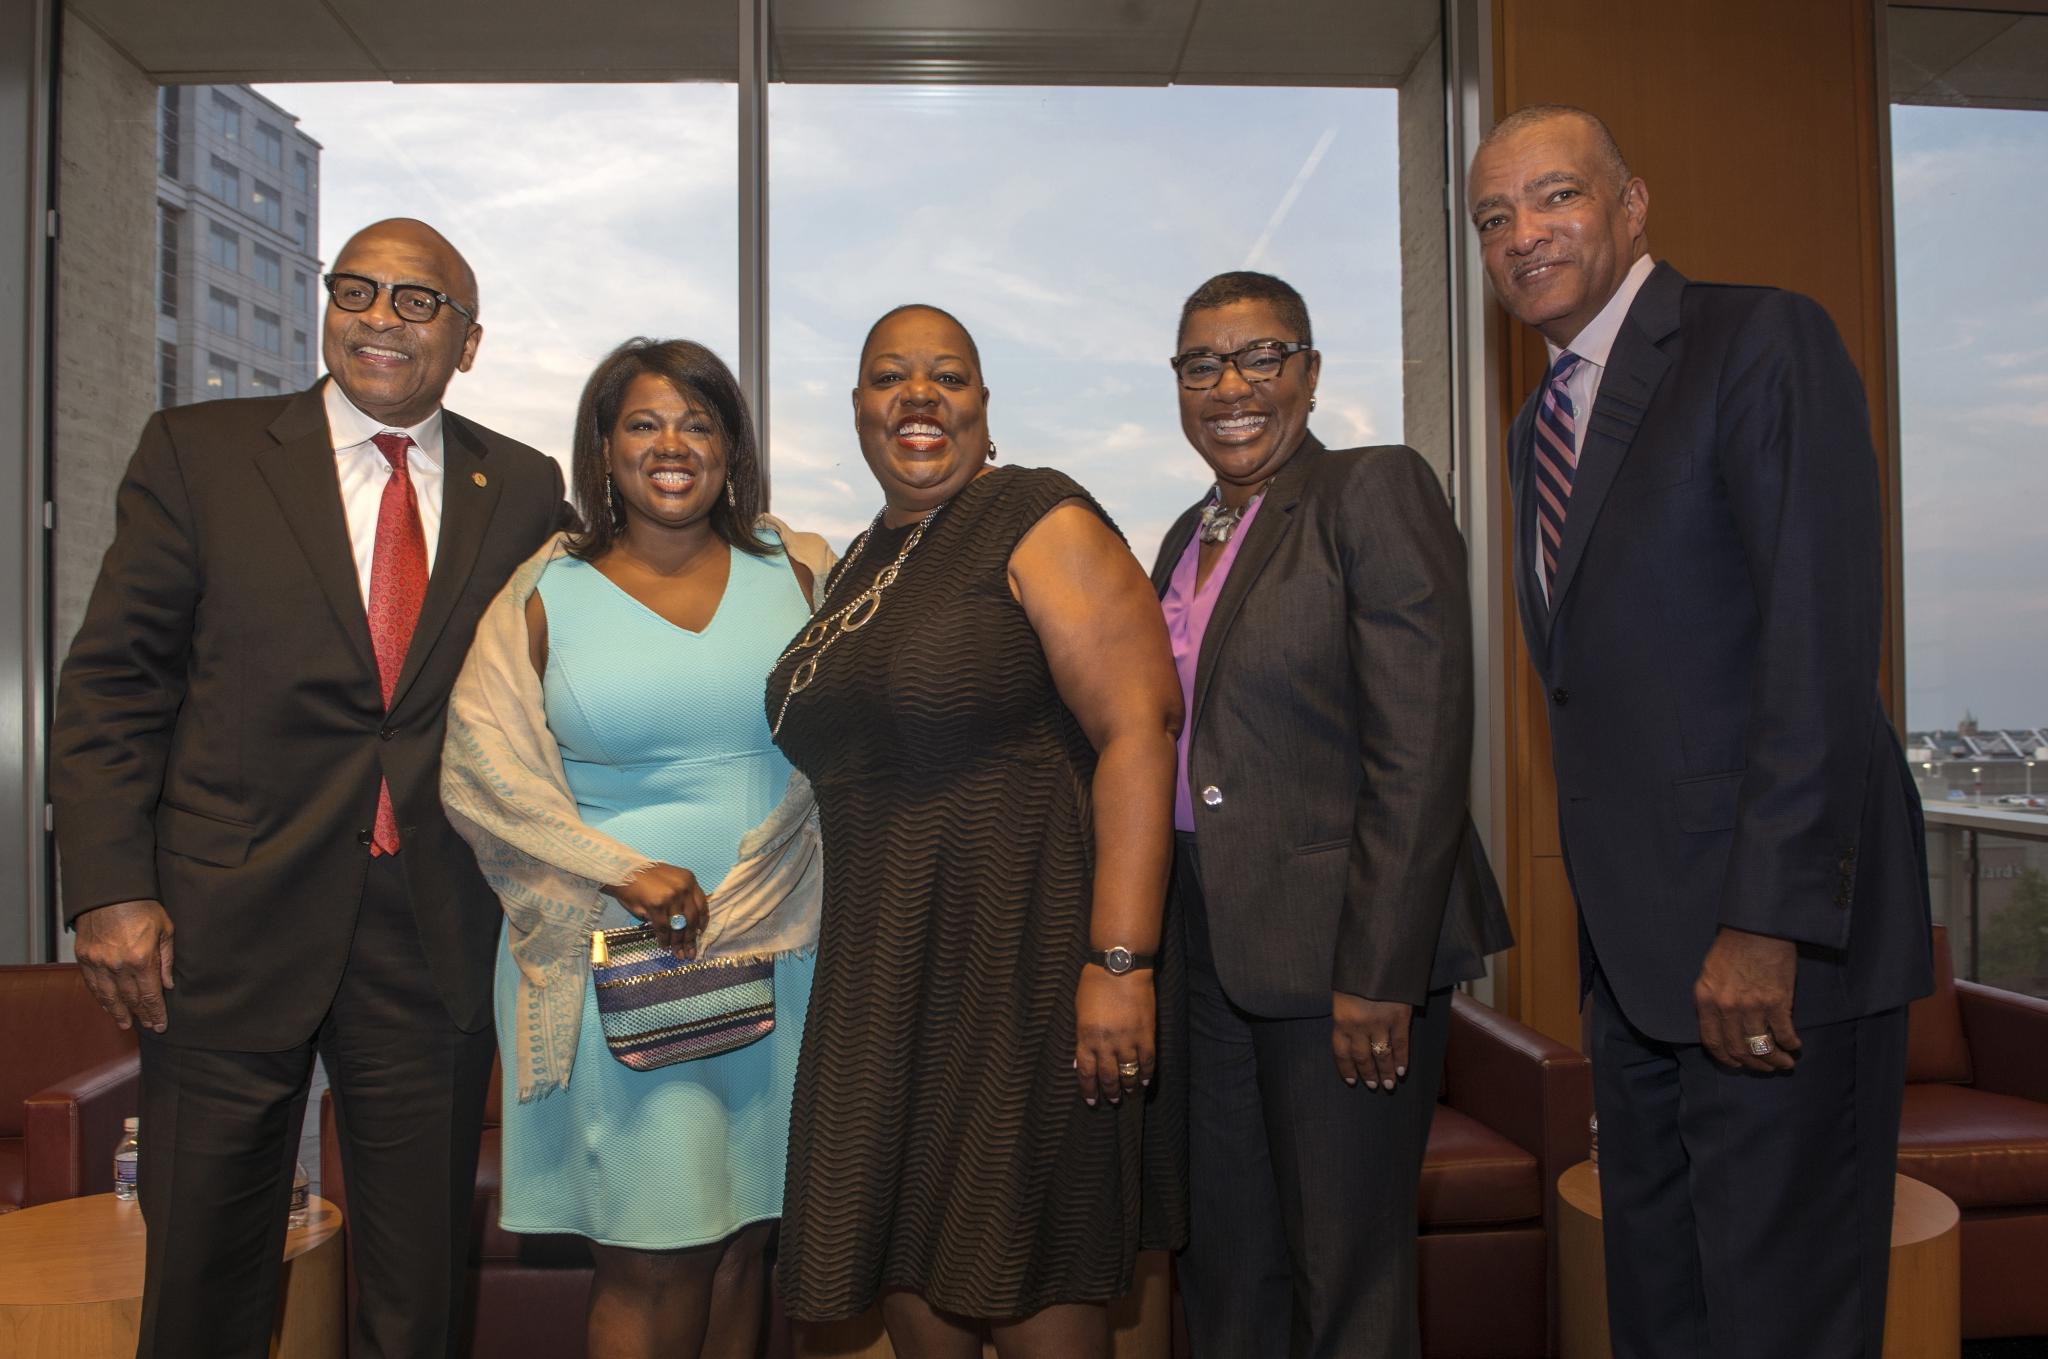 Panelists discuss Black philanthropy in Hampton Roads